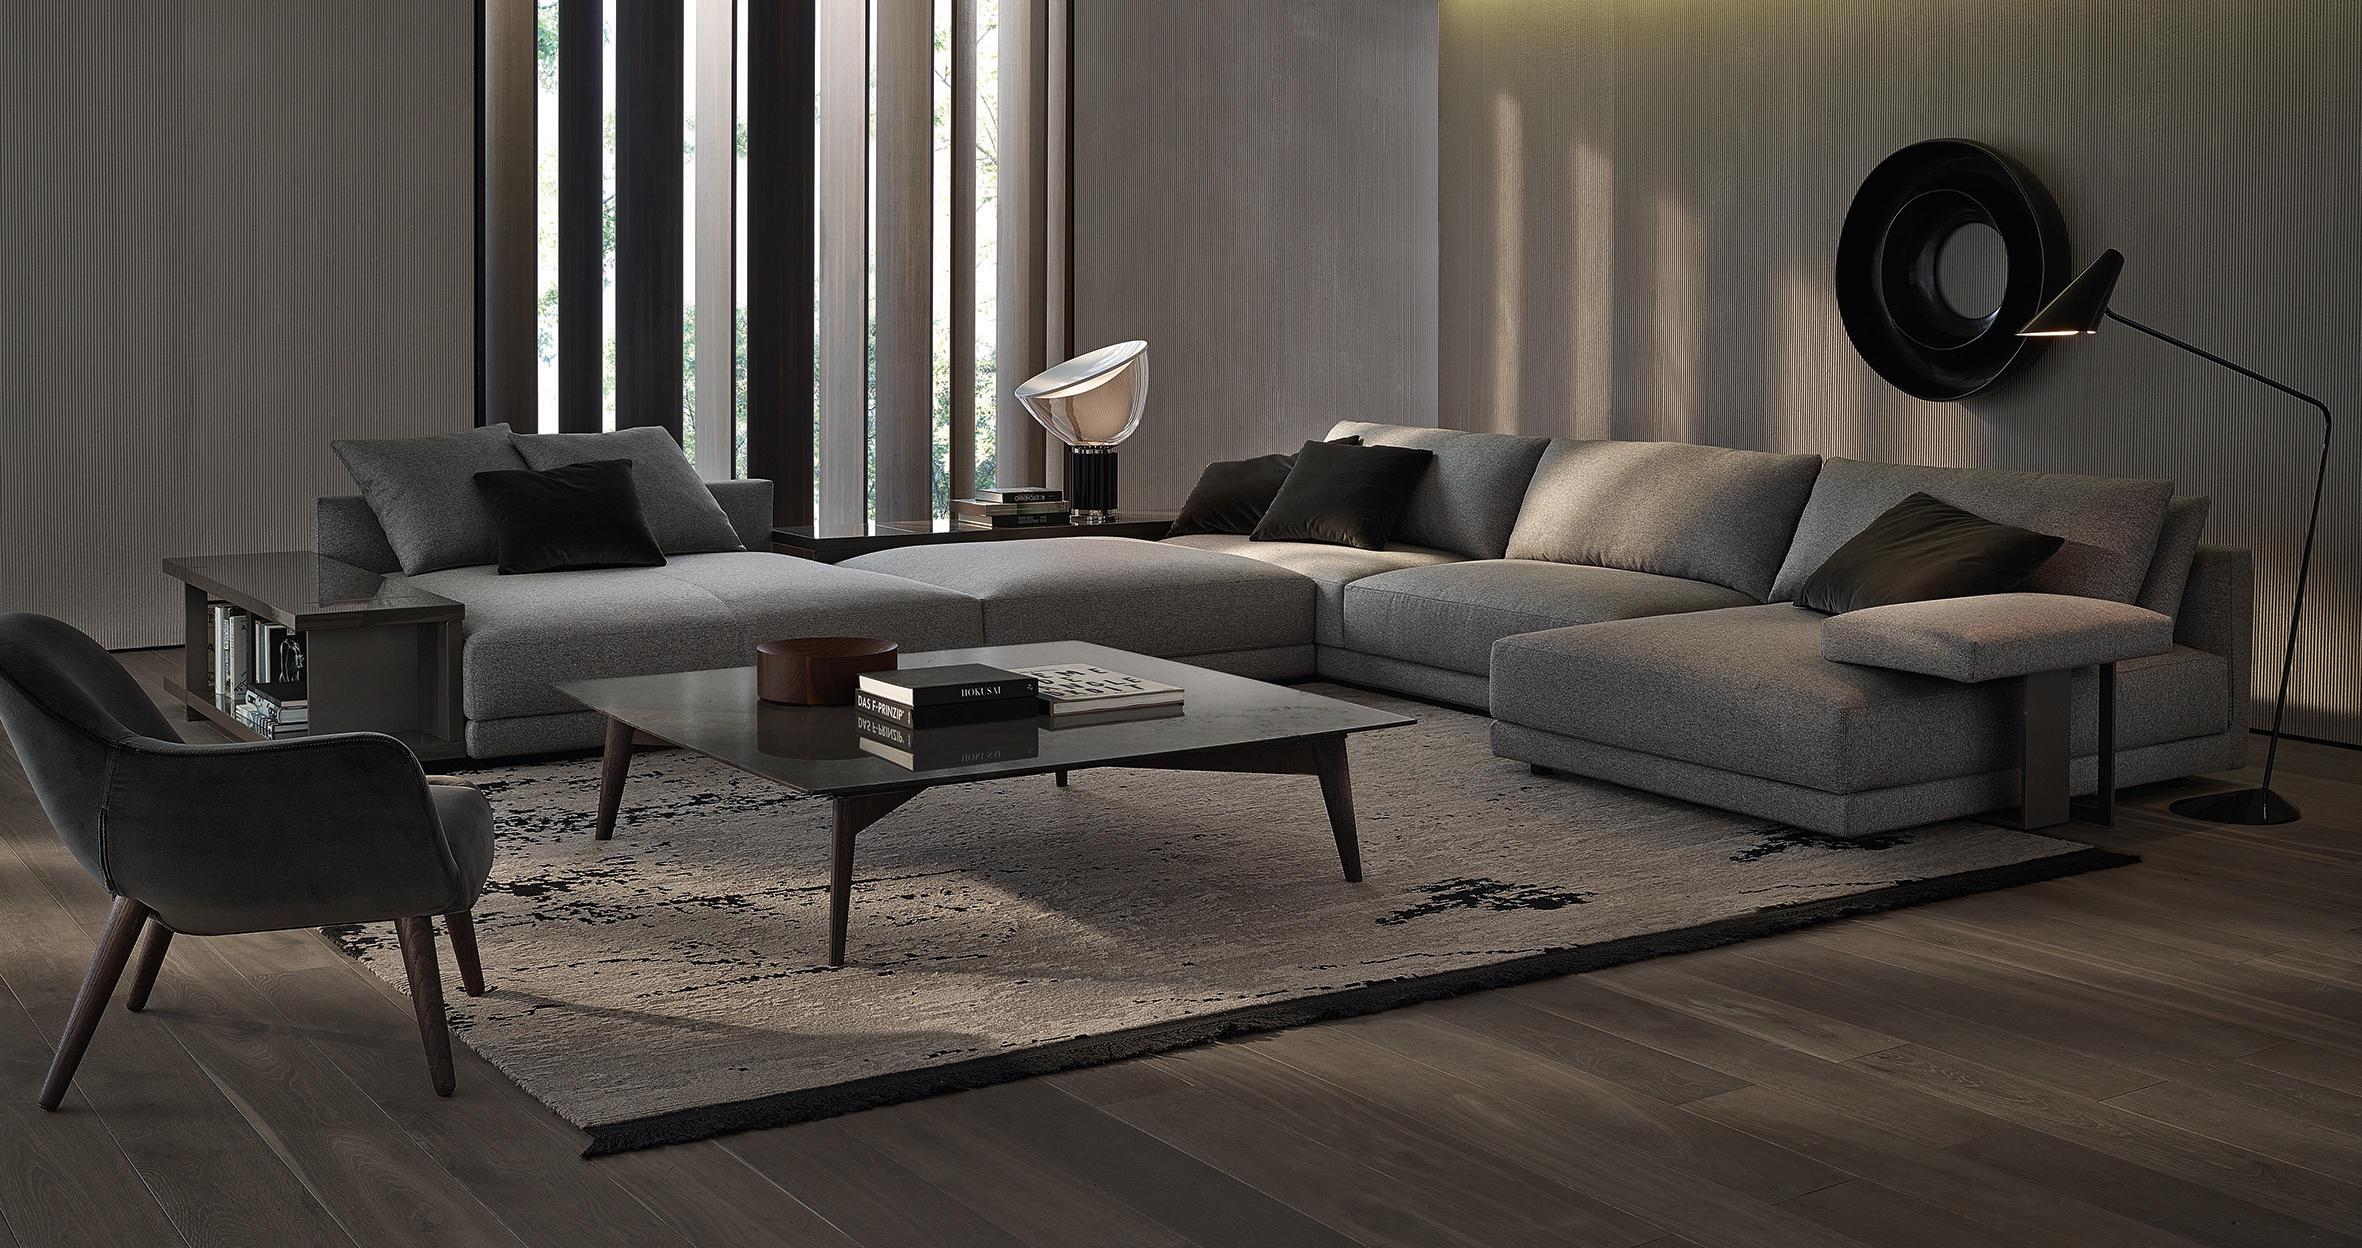 bristol sofa sofas from poliform architonic. Black Bedroom Furniture Sets. Home Design Ideas